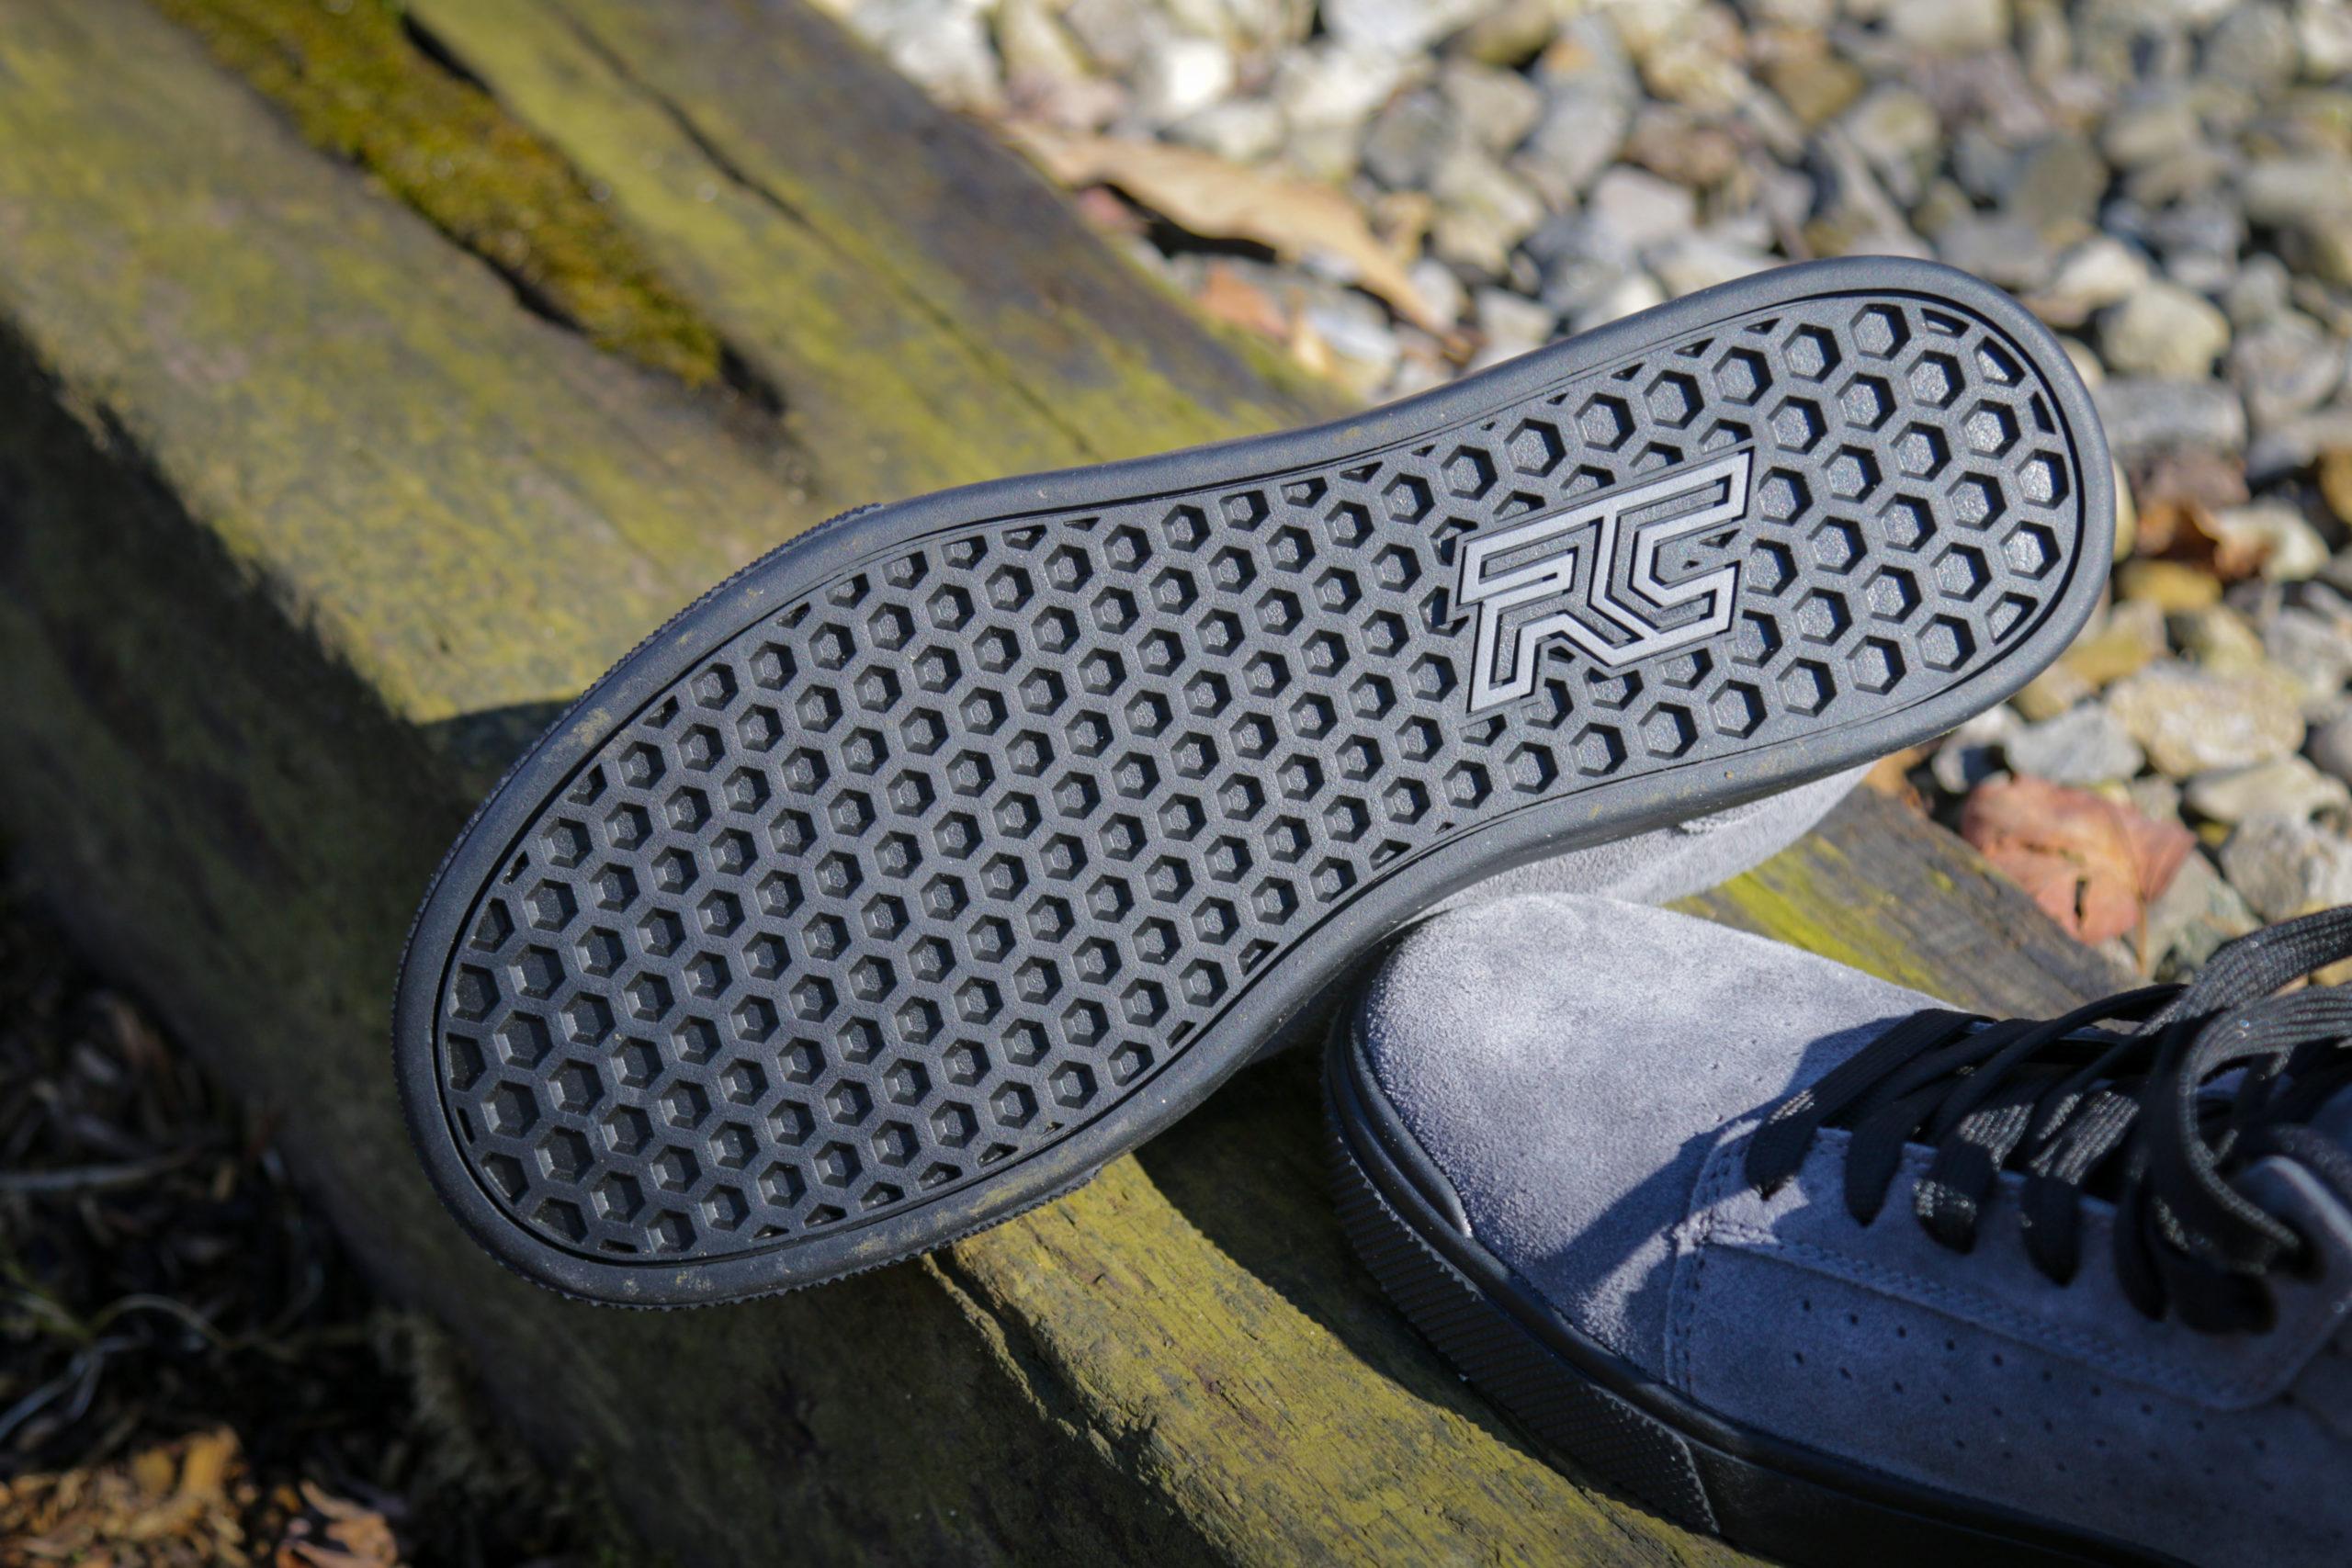 Ride Concepts Vice Mid shoe outsole